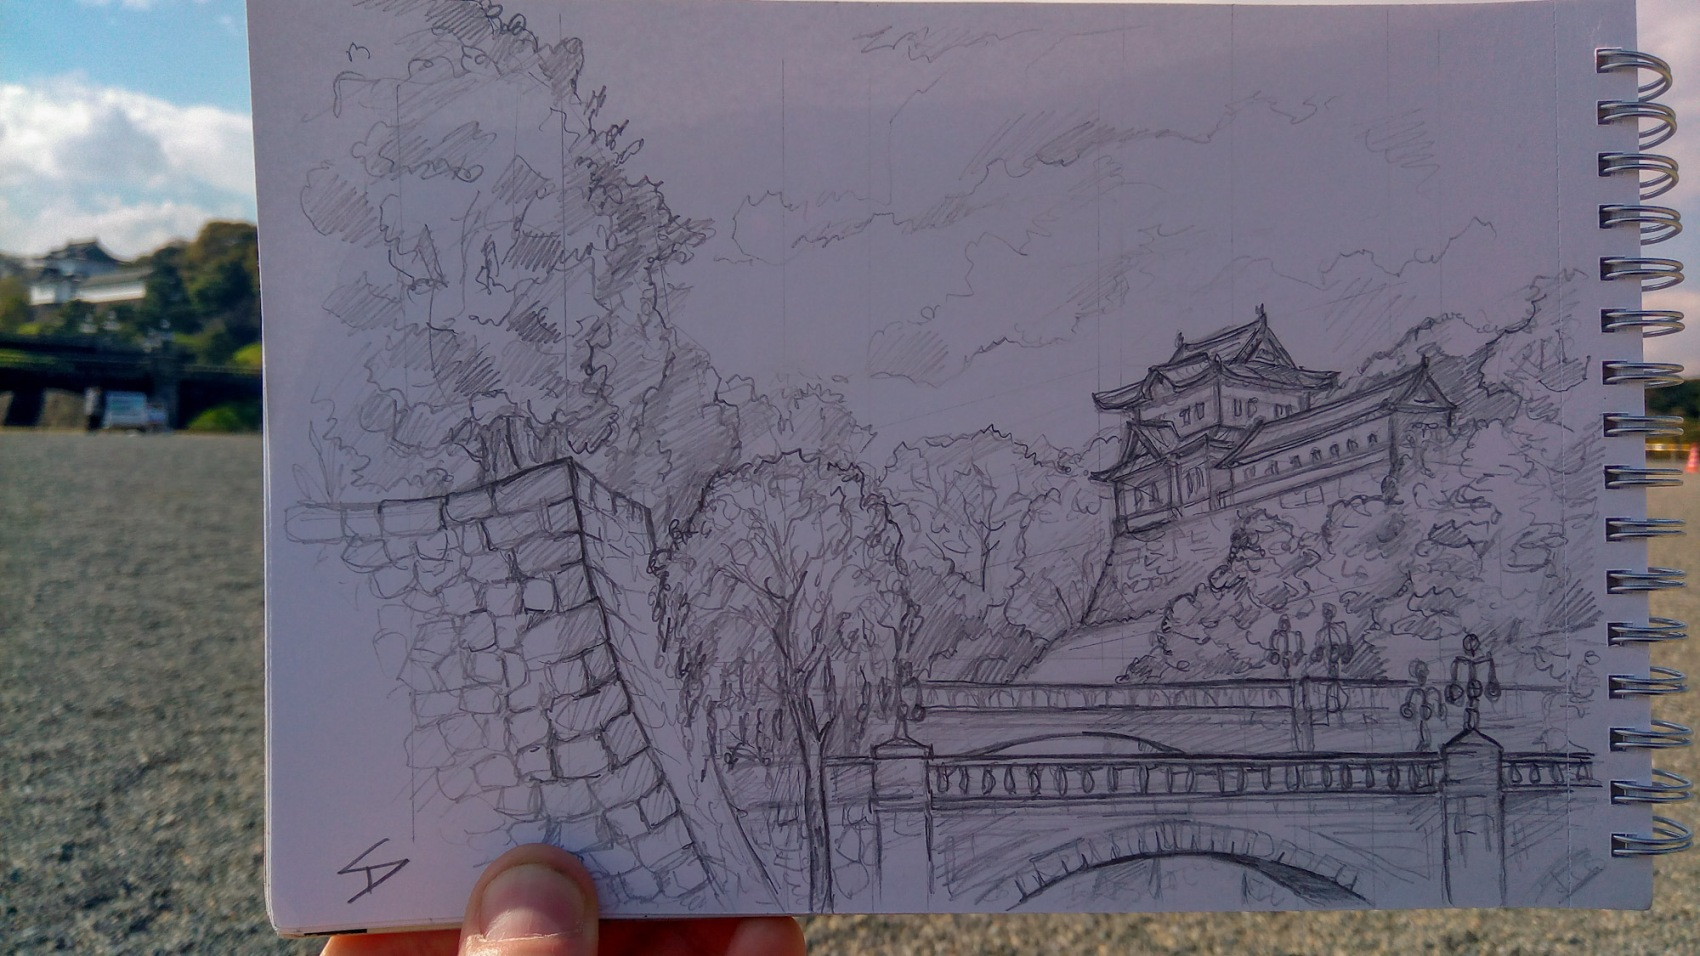 Urban photo art – Chiyoda City, Tokyo, Japan. 'Imperial Palace.' Artwork from my latest travel art blog article 'Sakura Japan.' Now online - sketchbookexplorer.com @davidasutton @sketchbookexplorer Facebook.com/davidanthonysutton #sketch #drawing #art #japan #tokyo #sakura #tokyoimperialpalace #samurai #travel #travelblog #cherryblossom #cherryblossomseason #cherryblossomjapan